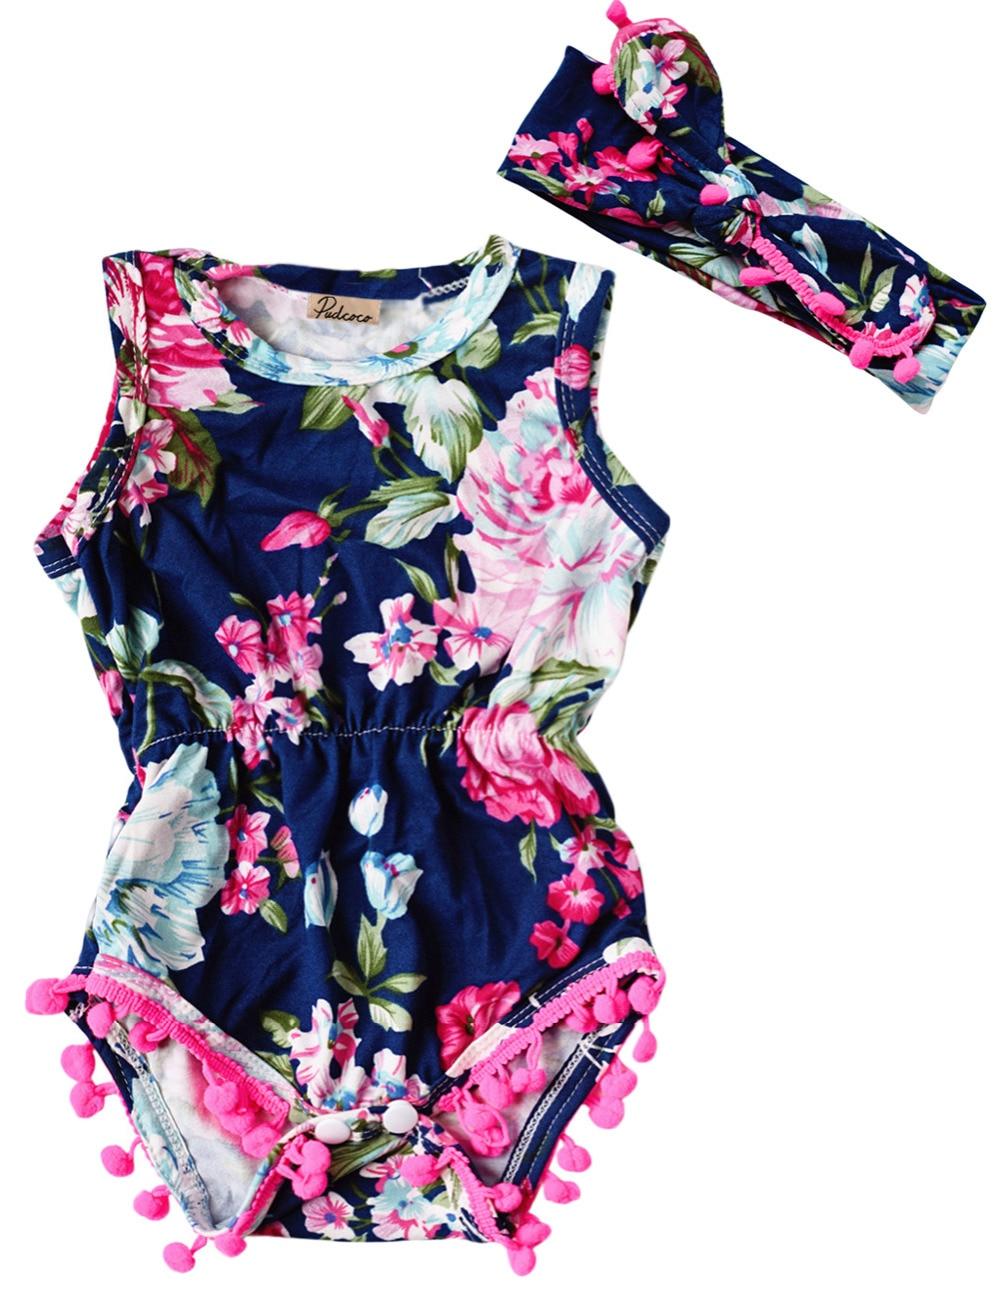 121e82183 New Baby Girl Pretty summer Romper Newborn Infant Baby Girls Floral ...